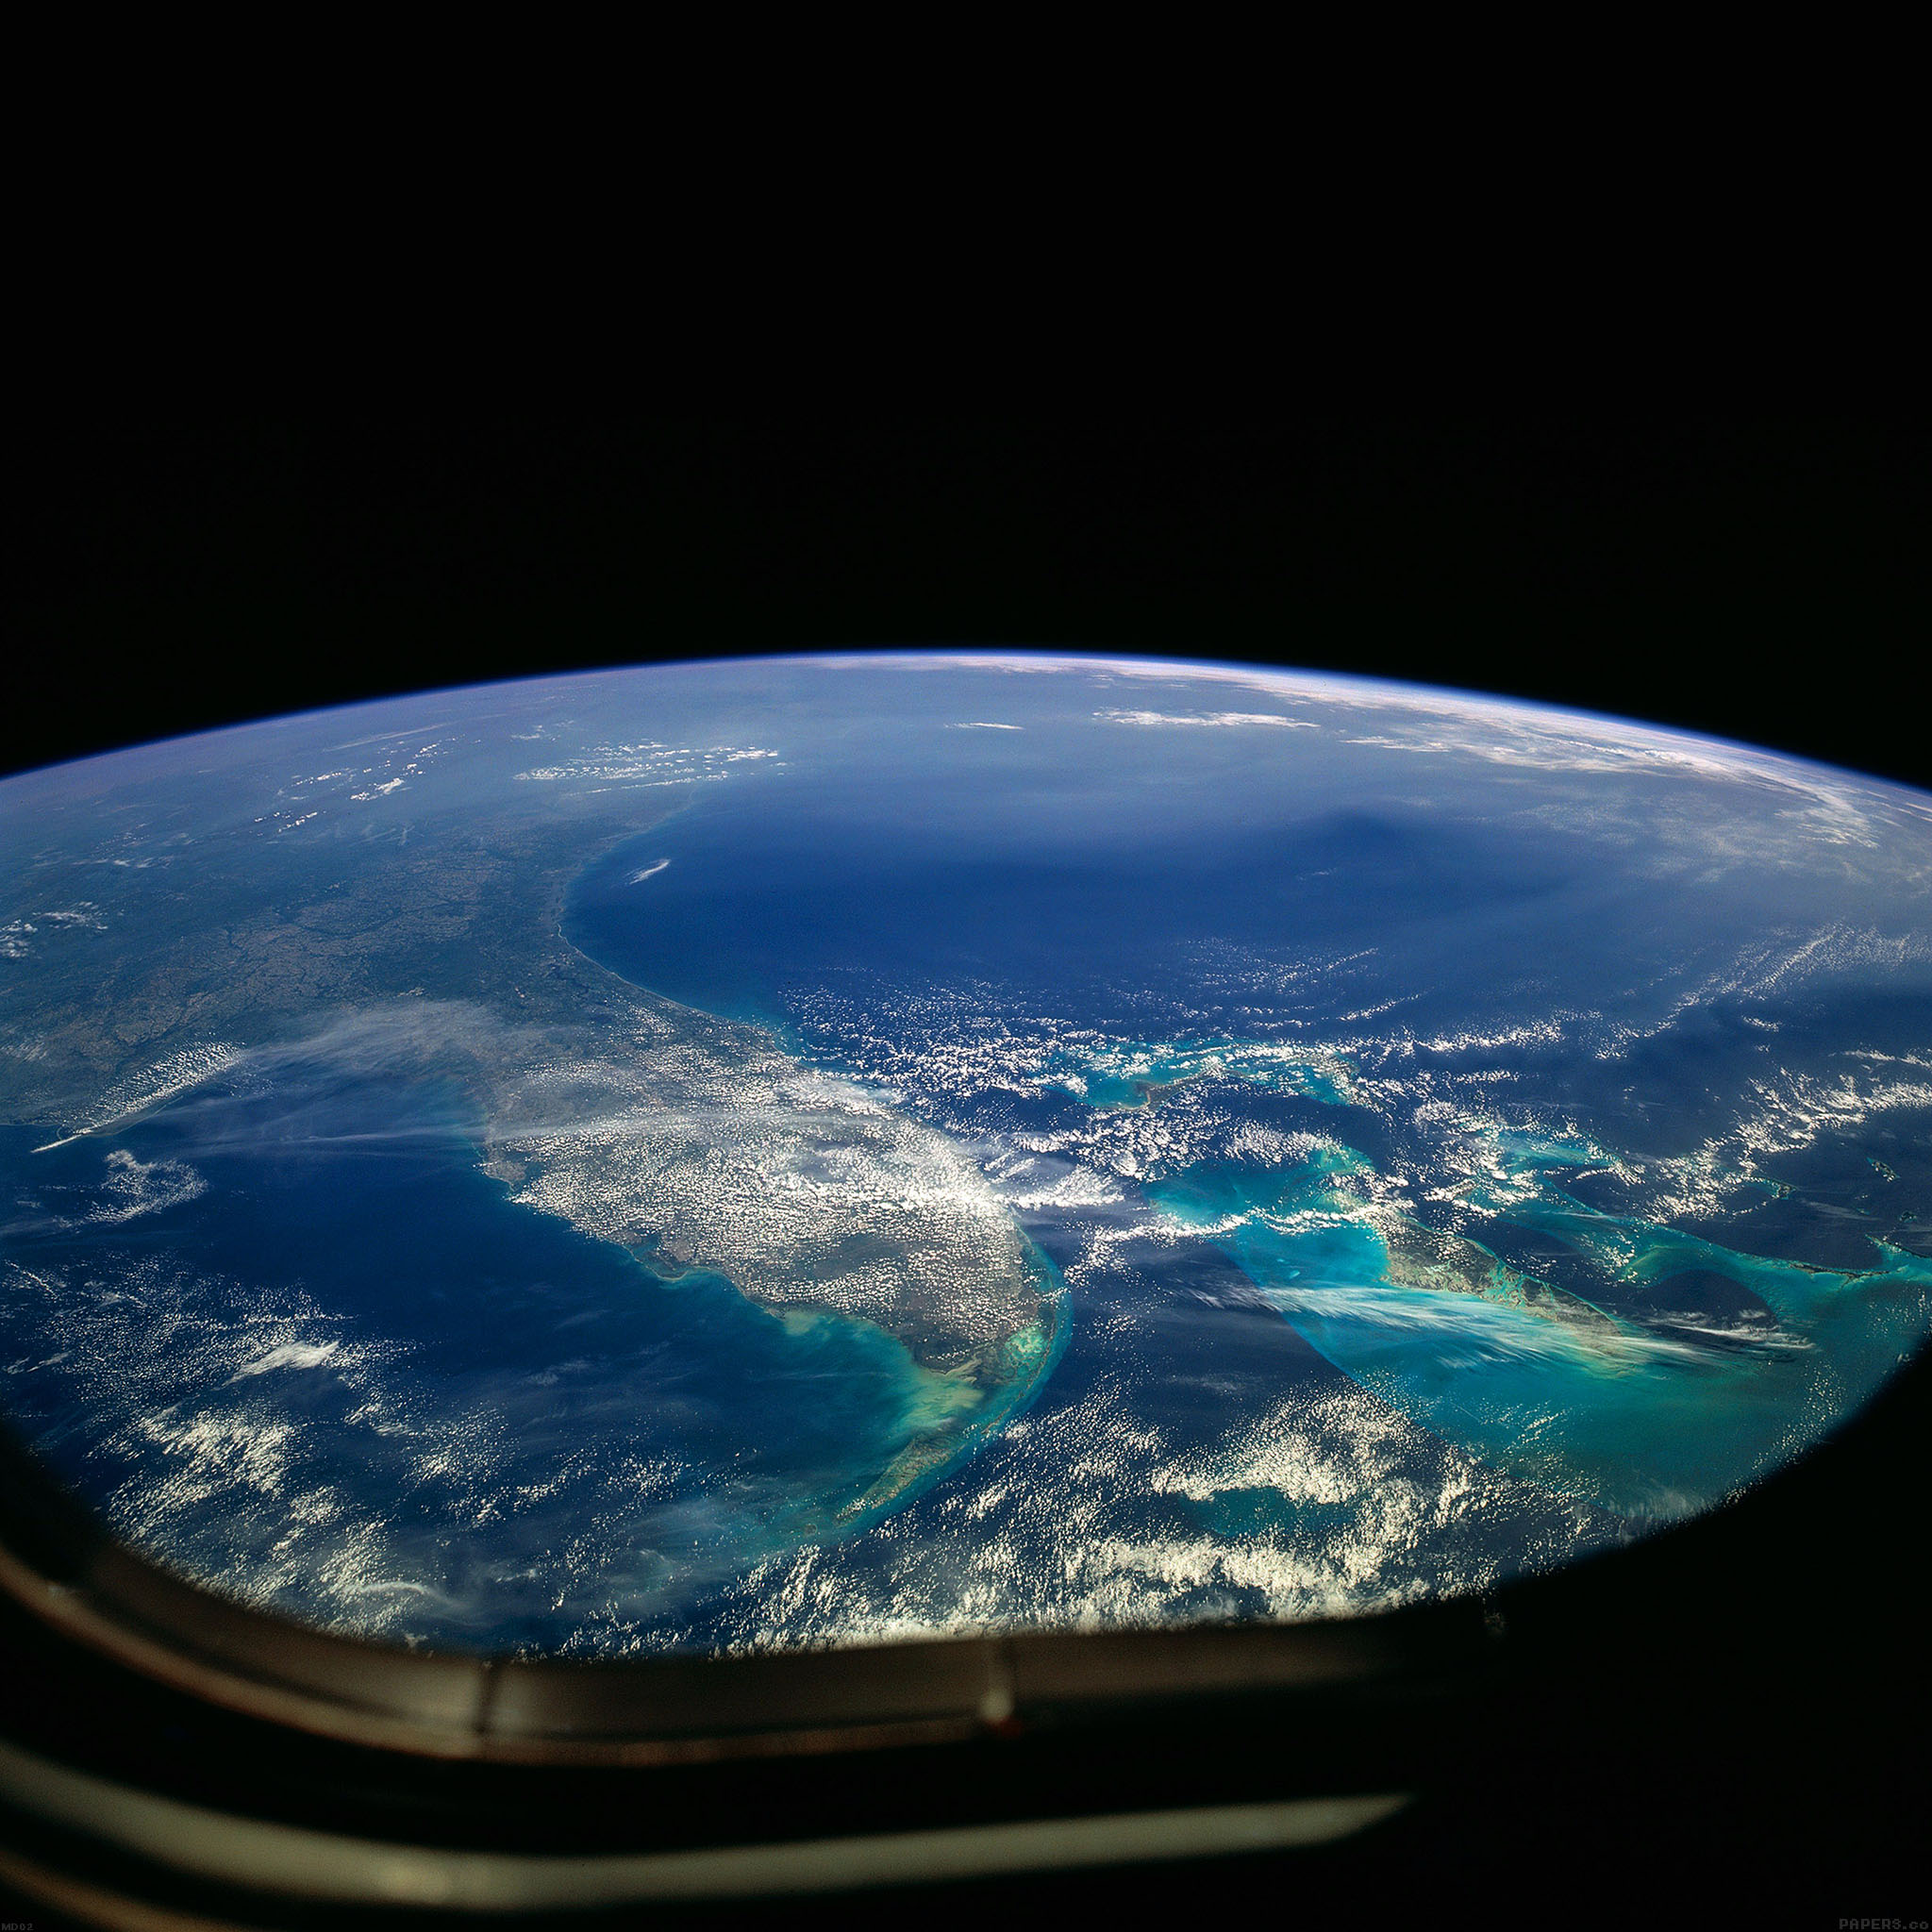 Desktop Wallpaper Earth From Space: Md02-wallpaper-alien-view-of-earth-space